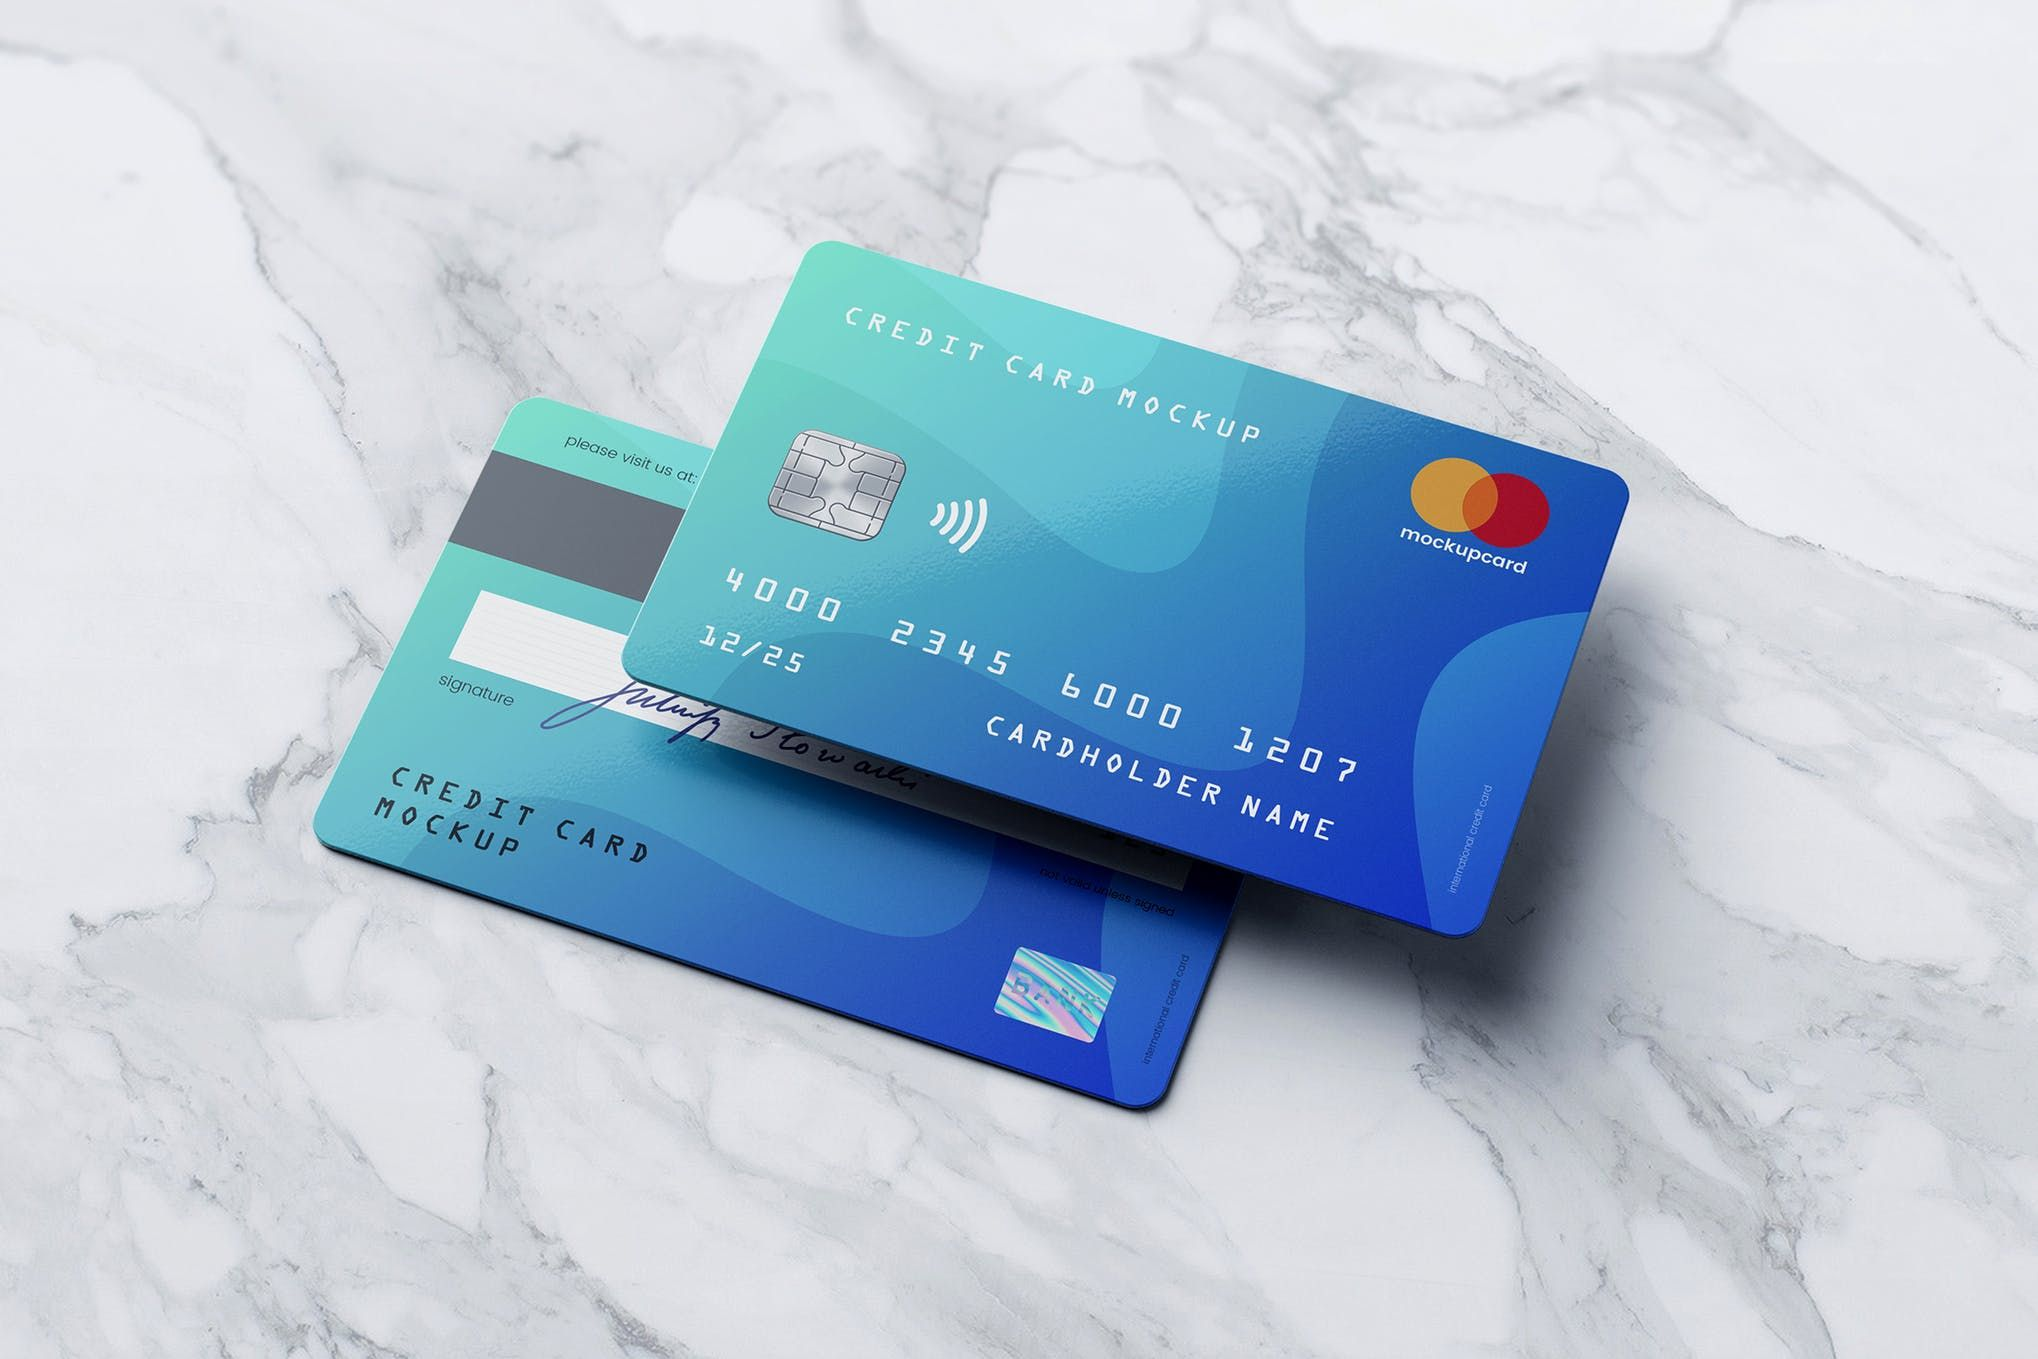 Credit Card Membership Card Mockup By Goner13 On